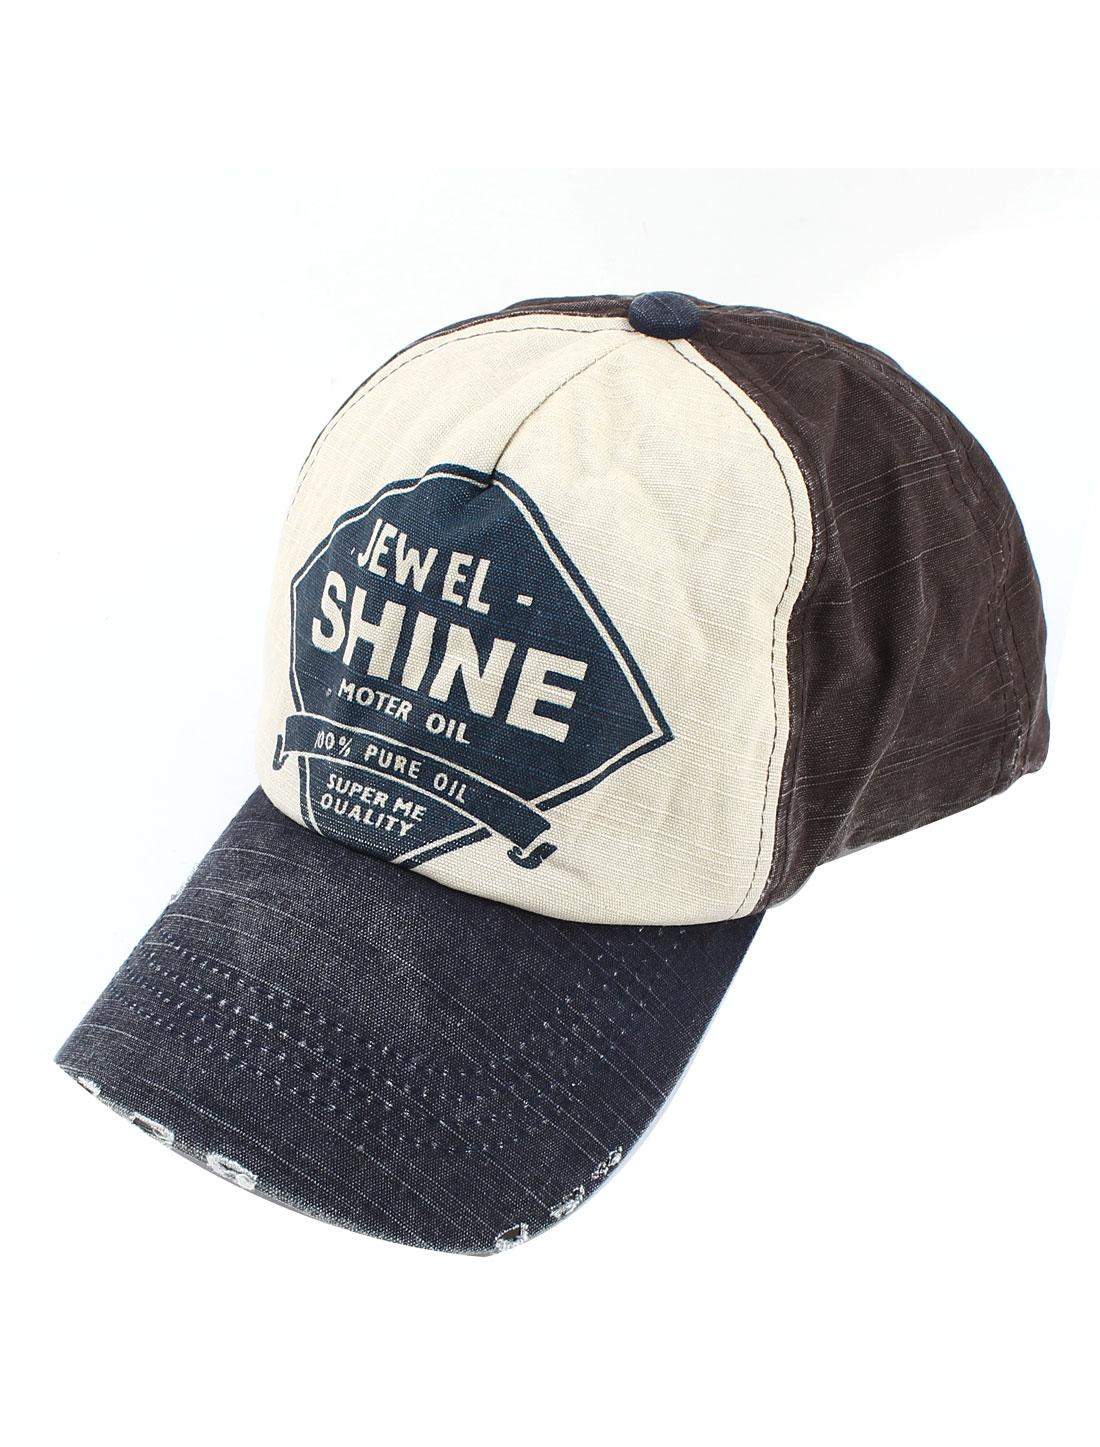 Women Men Visor Front Letter Pattern Summer Peaked Cap Cricket-Cap Dark Blue